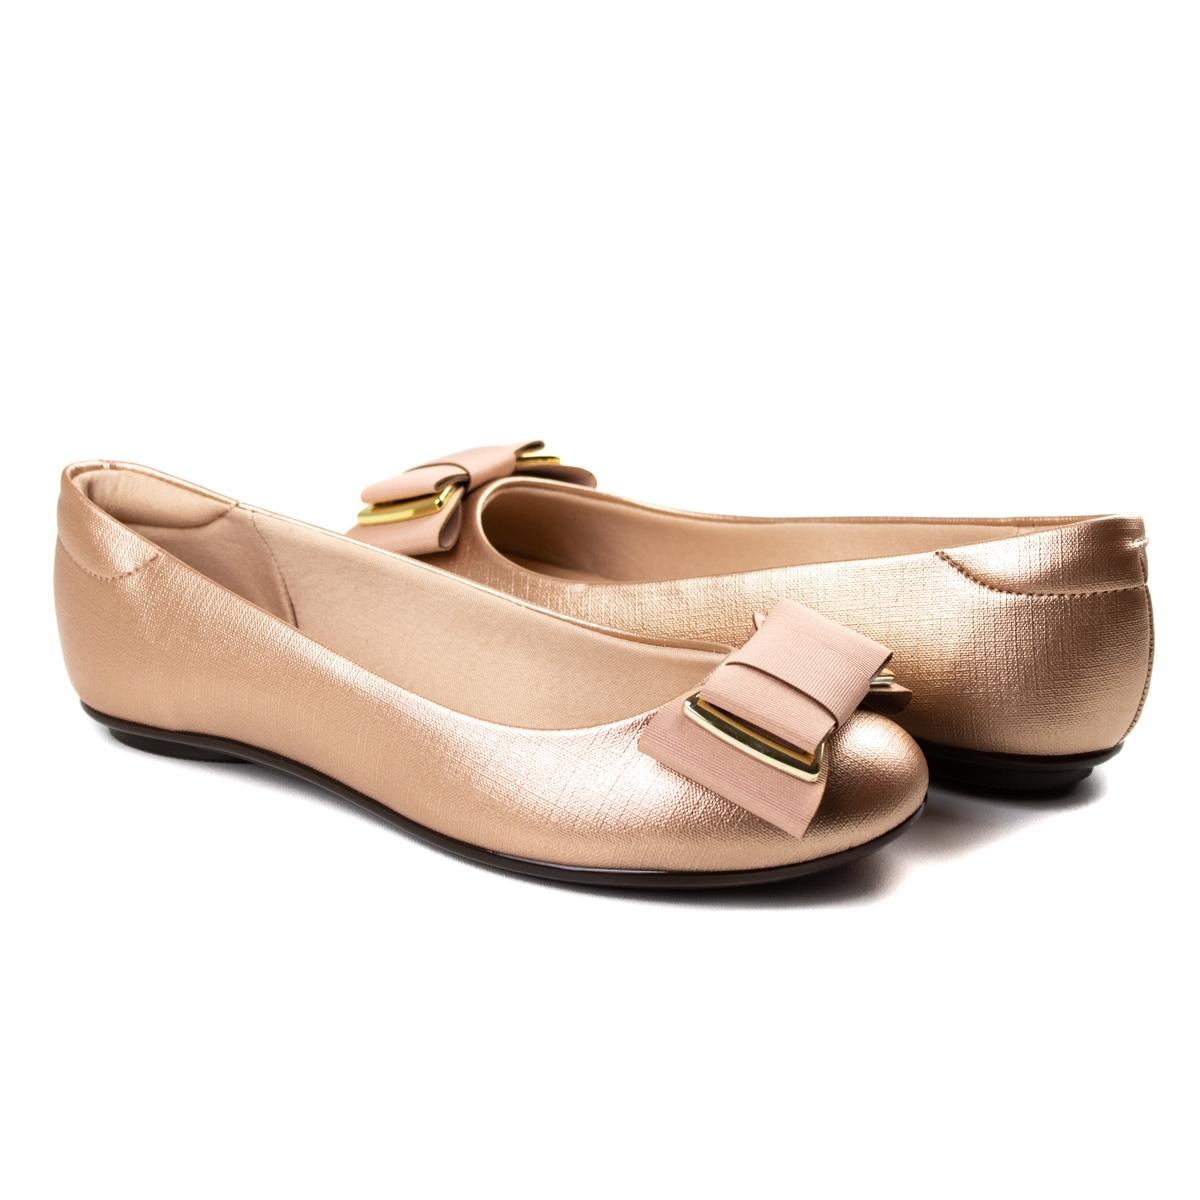 Sapatilha Sarja Feminino Moleca - Ouro rosado